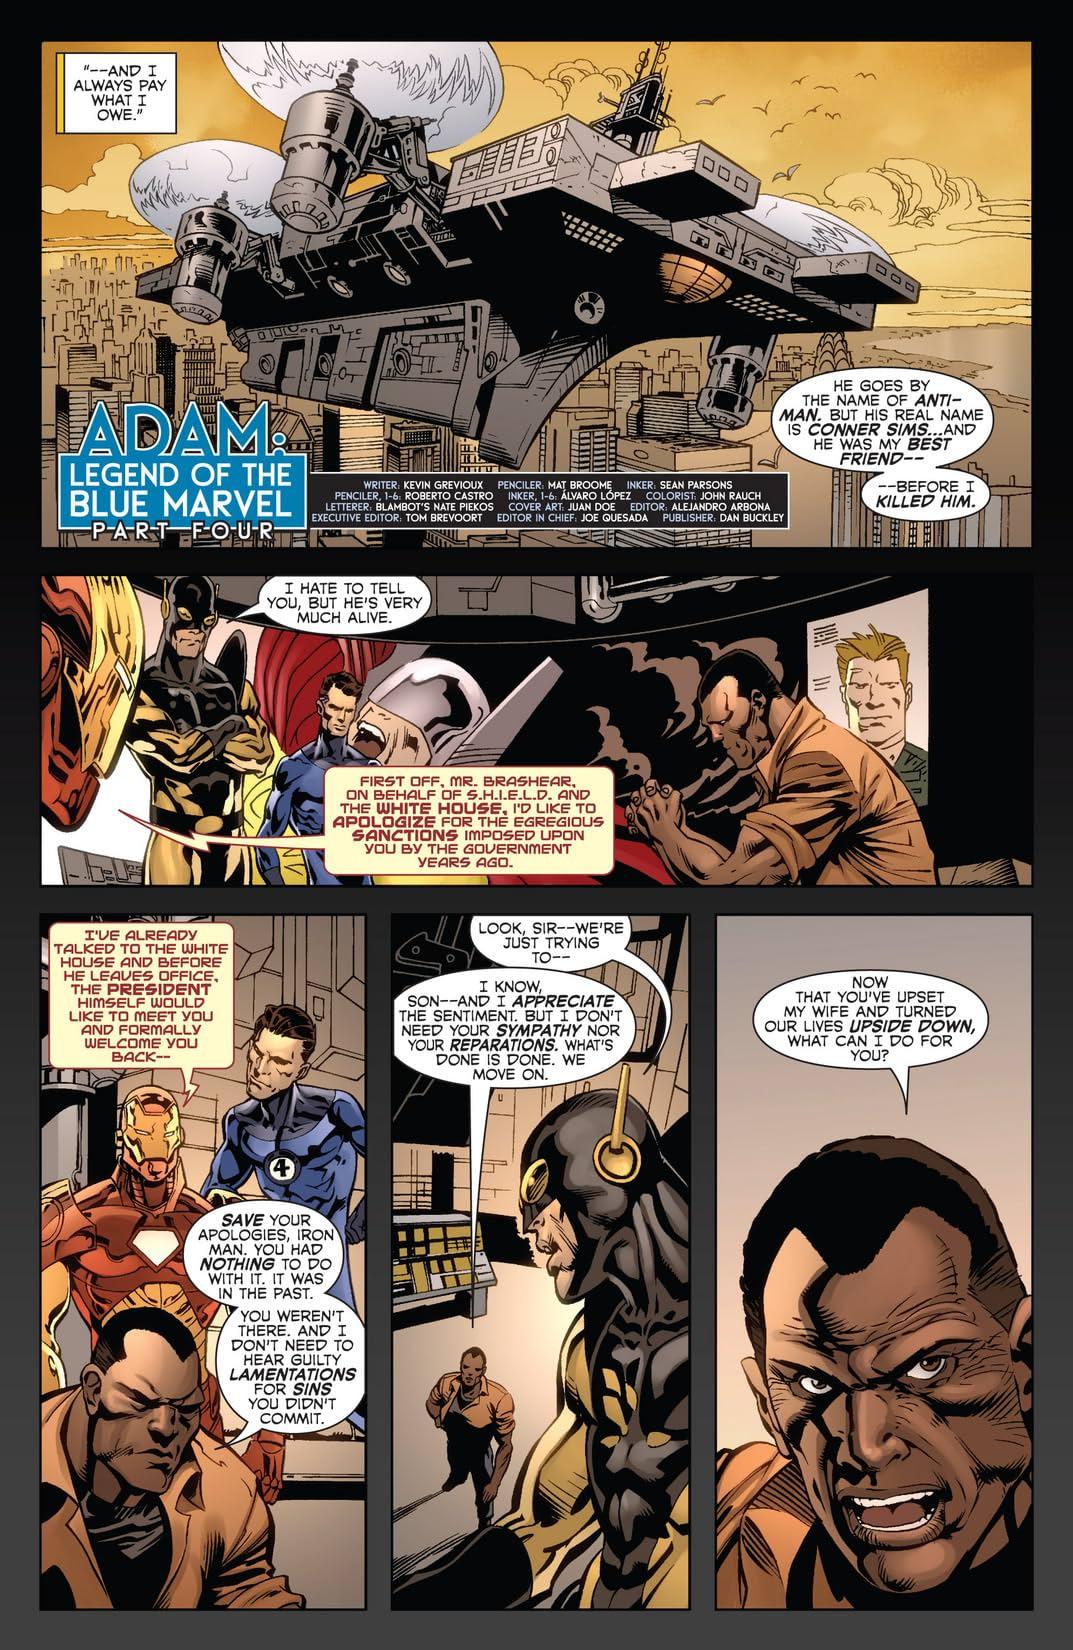 Adam: Legend of the Blue Marvel #4 (of 5)